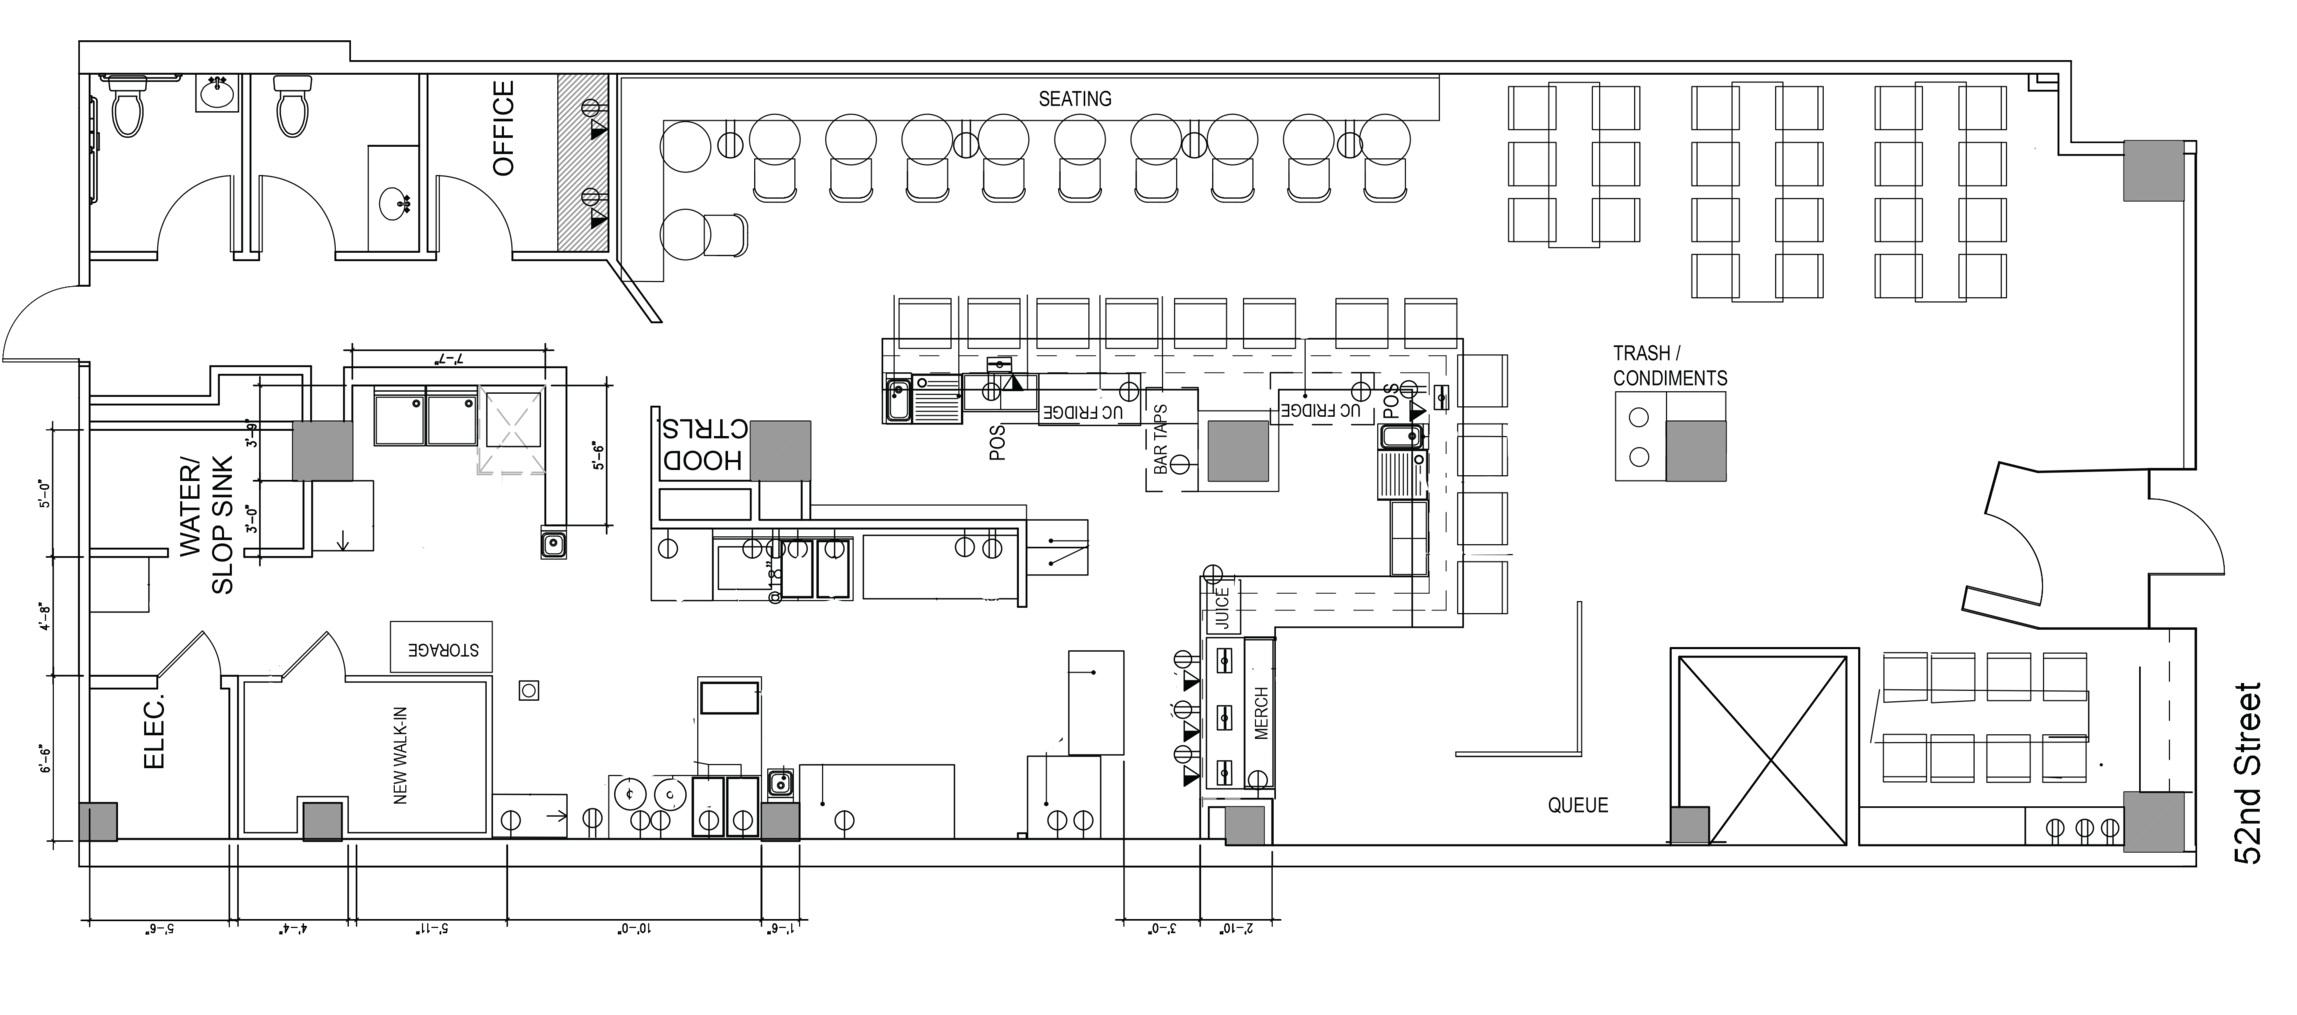 52nd+street+floorplan.jpg